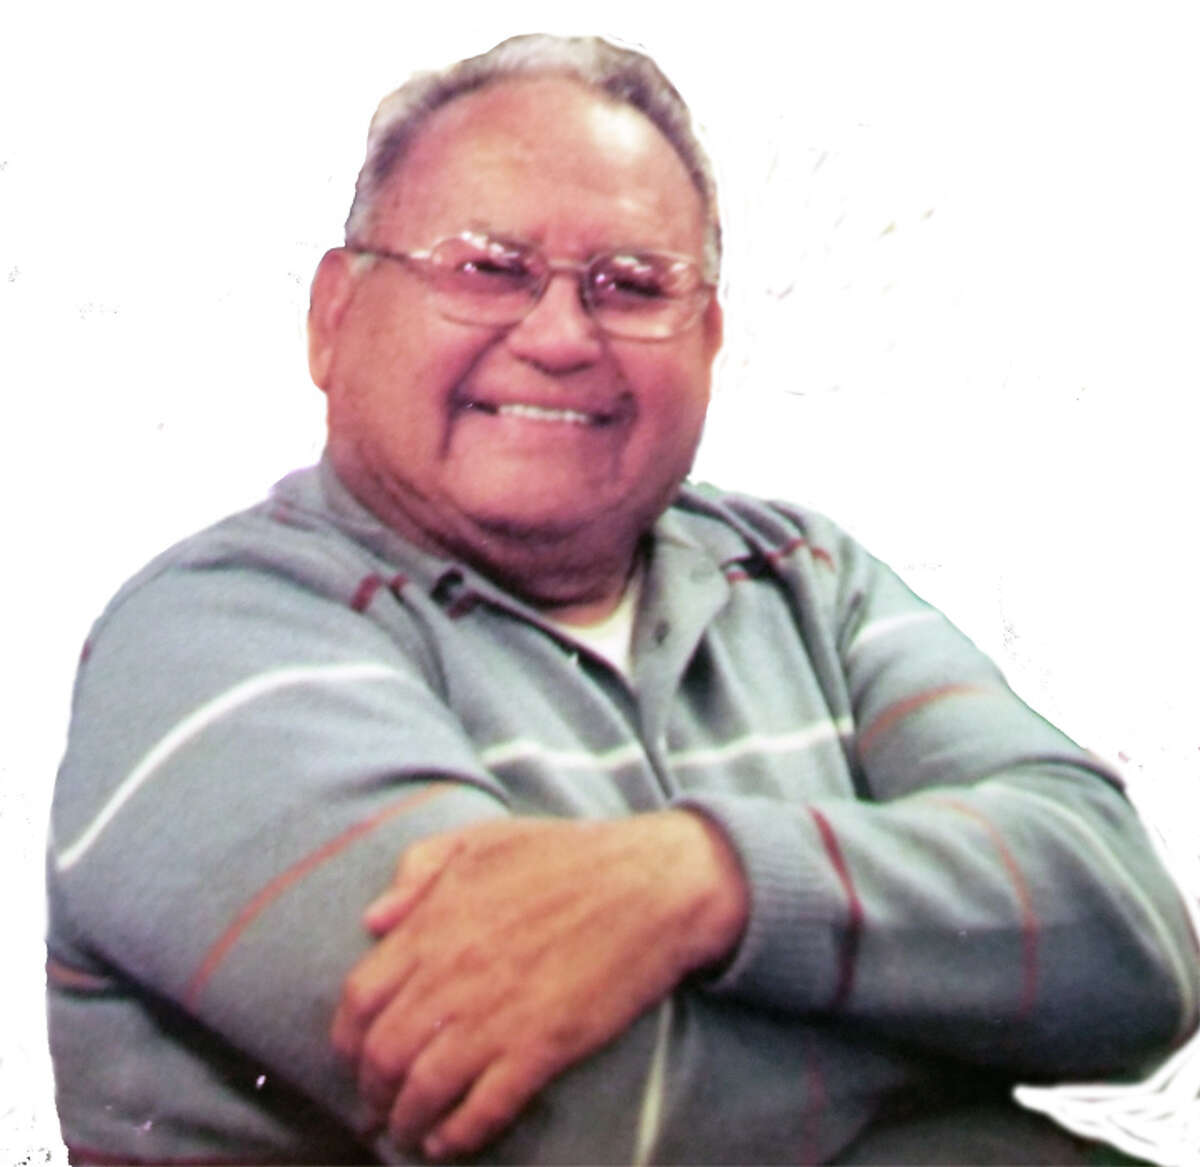 Miguel A. Molina